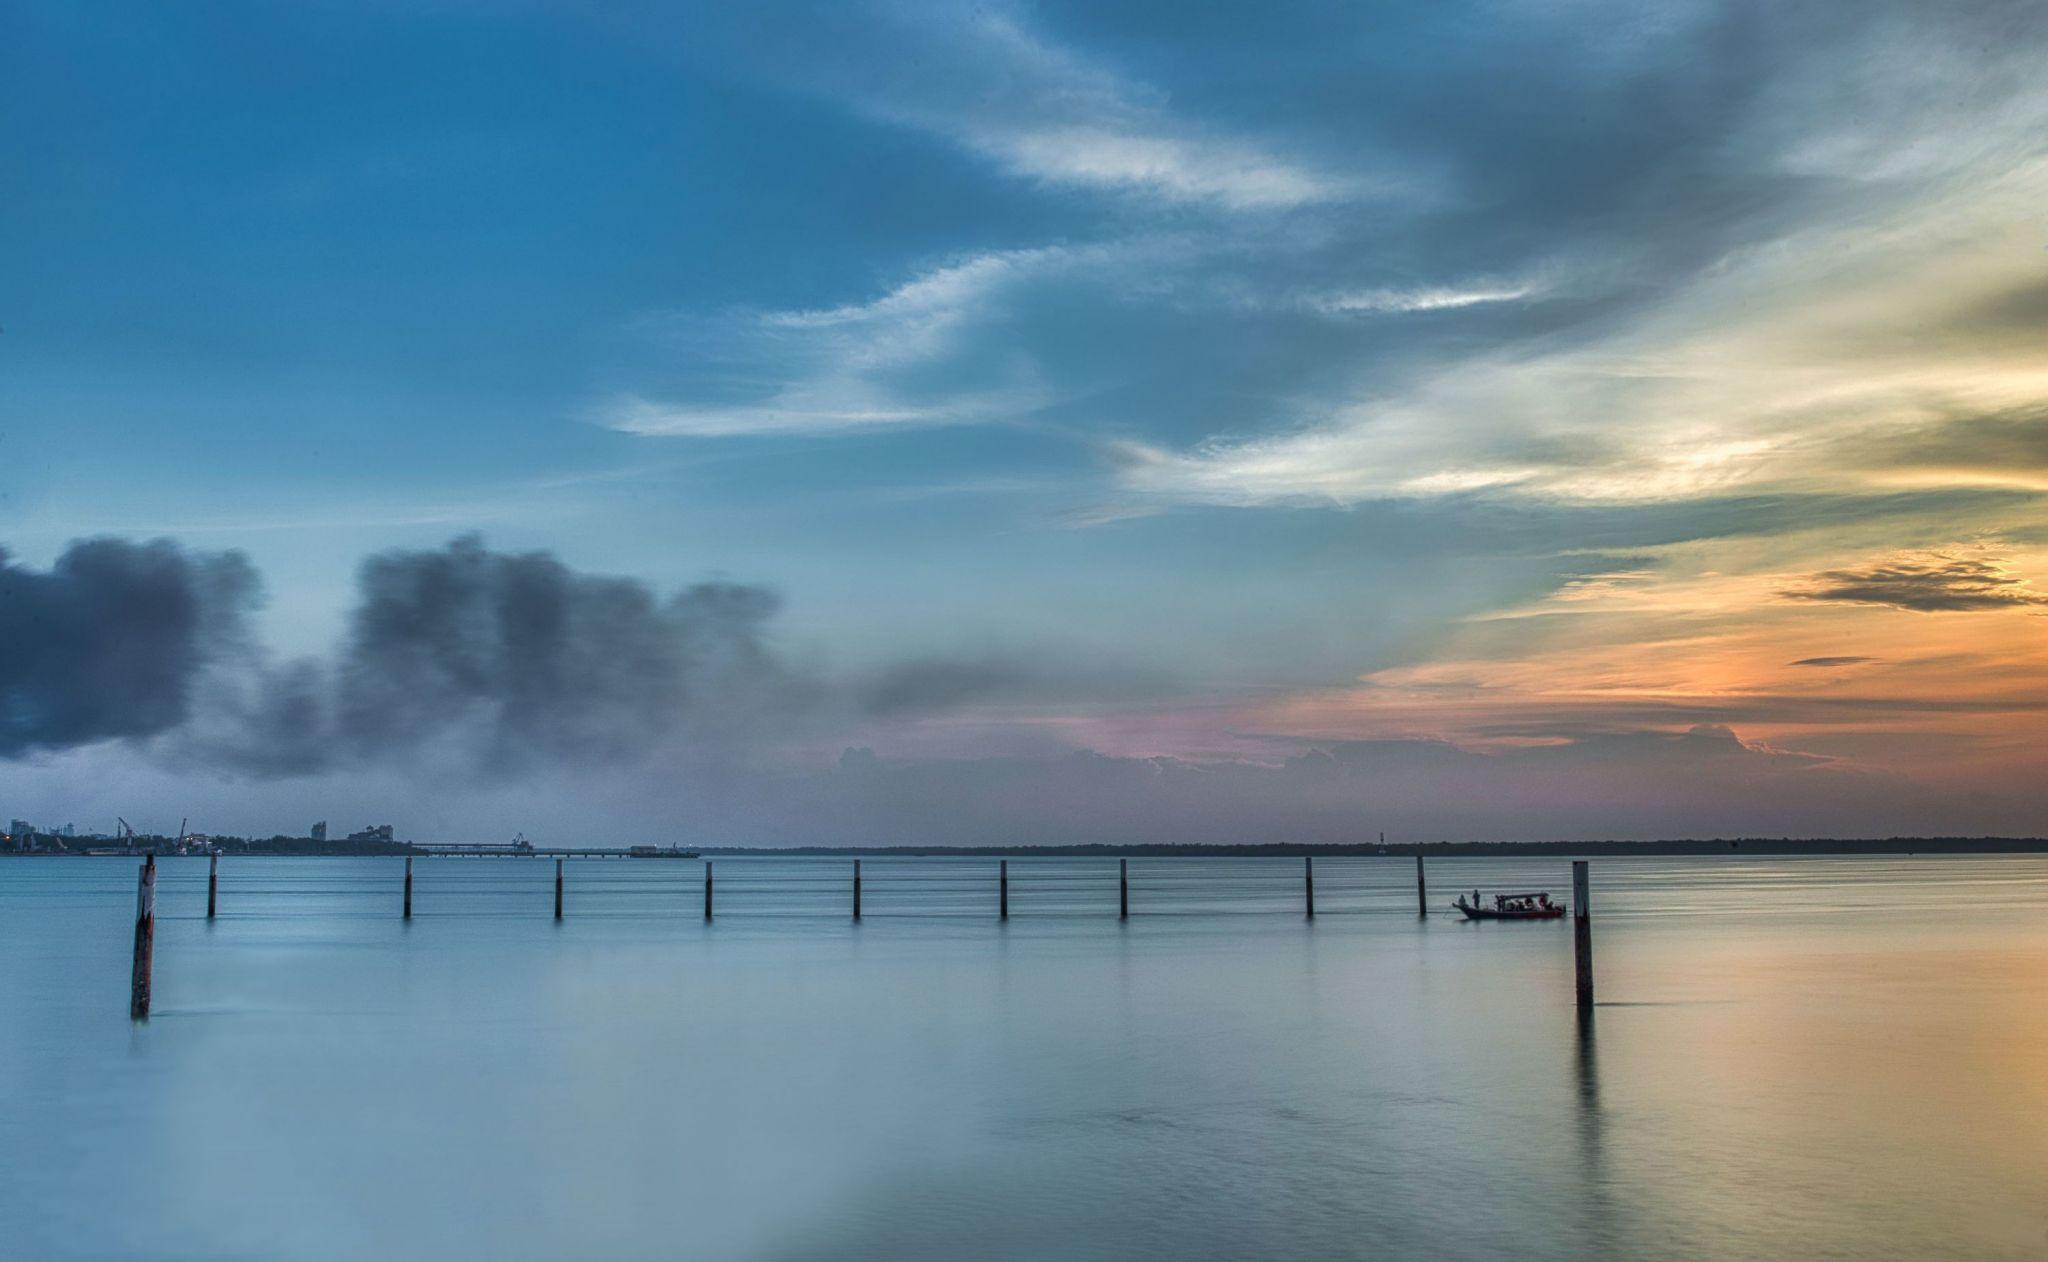 Tanjung Harapan Sunset, Malaysia